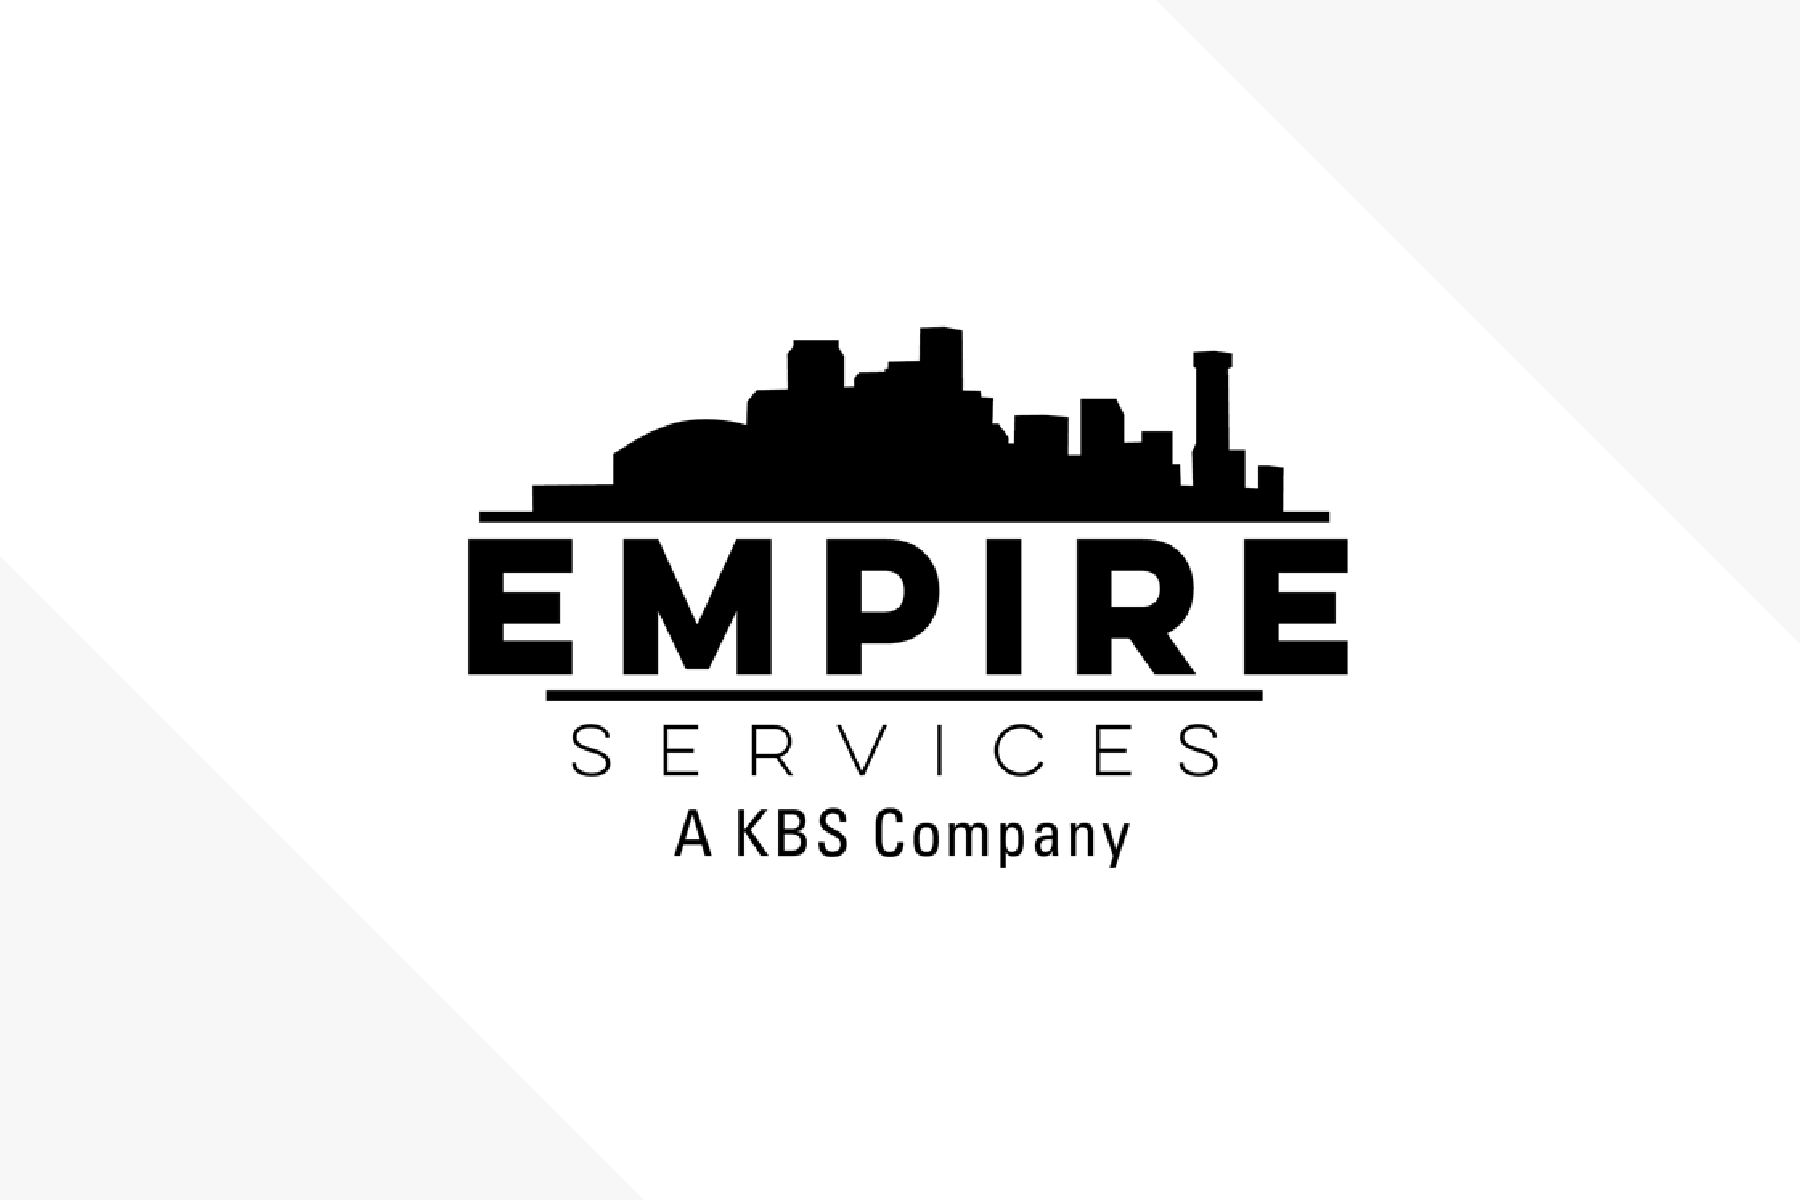 Empire Services